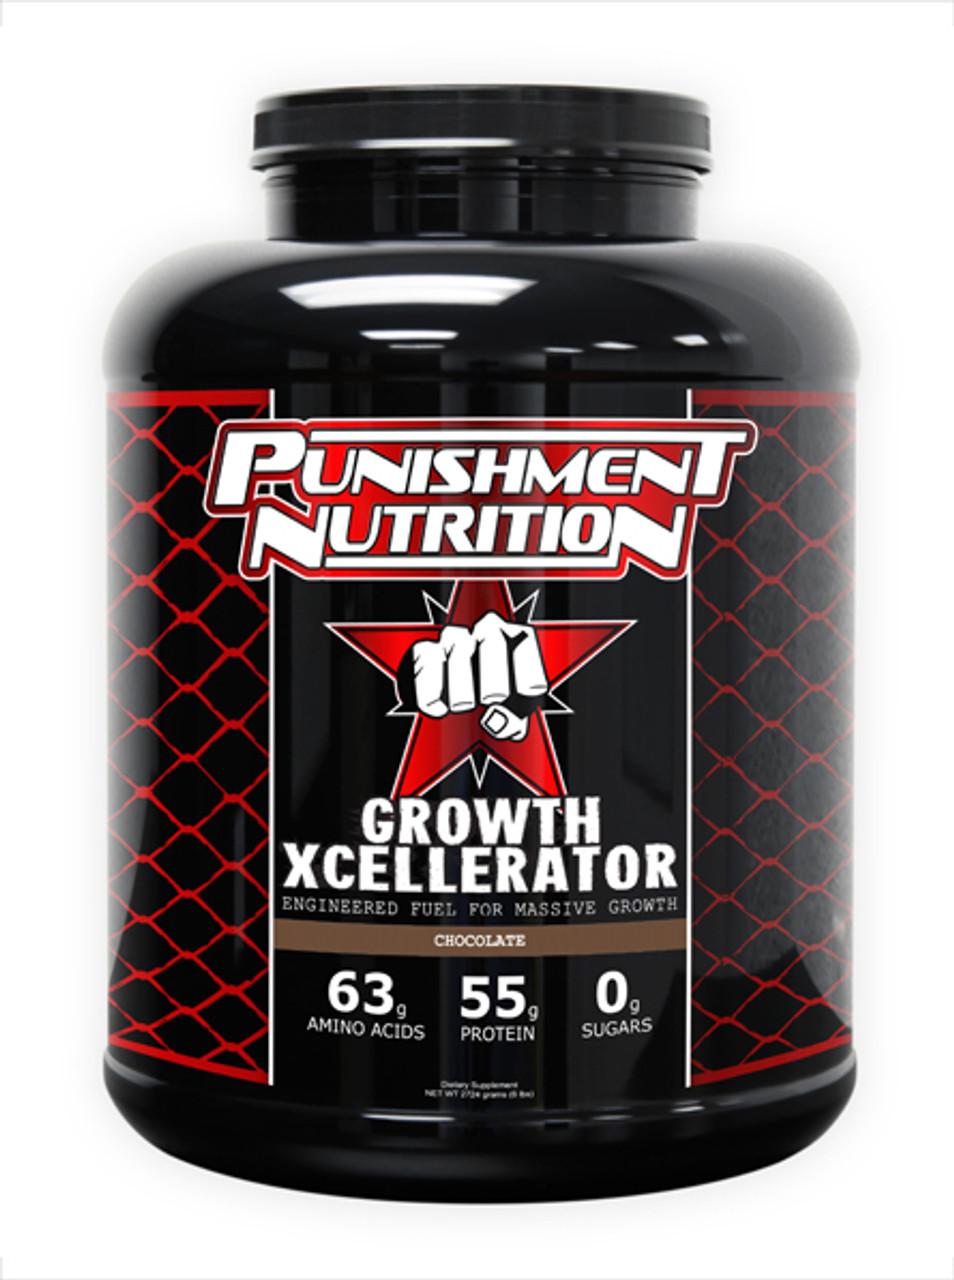 Growth Xcellerator 6lb Punishment Nutrition